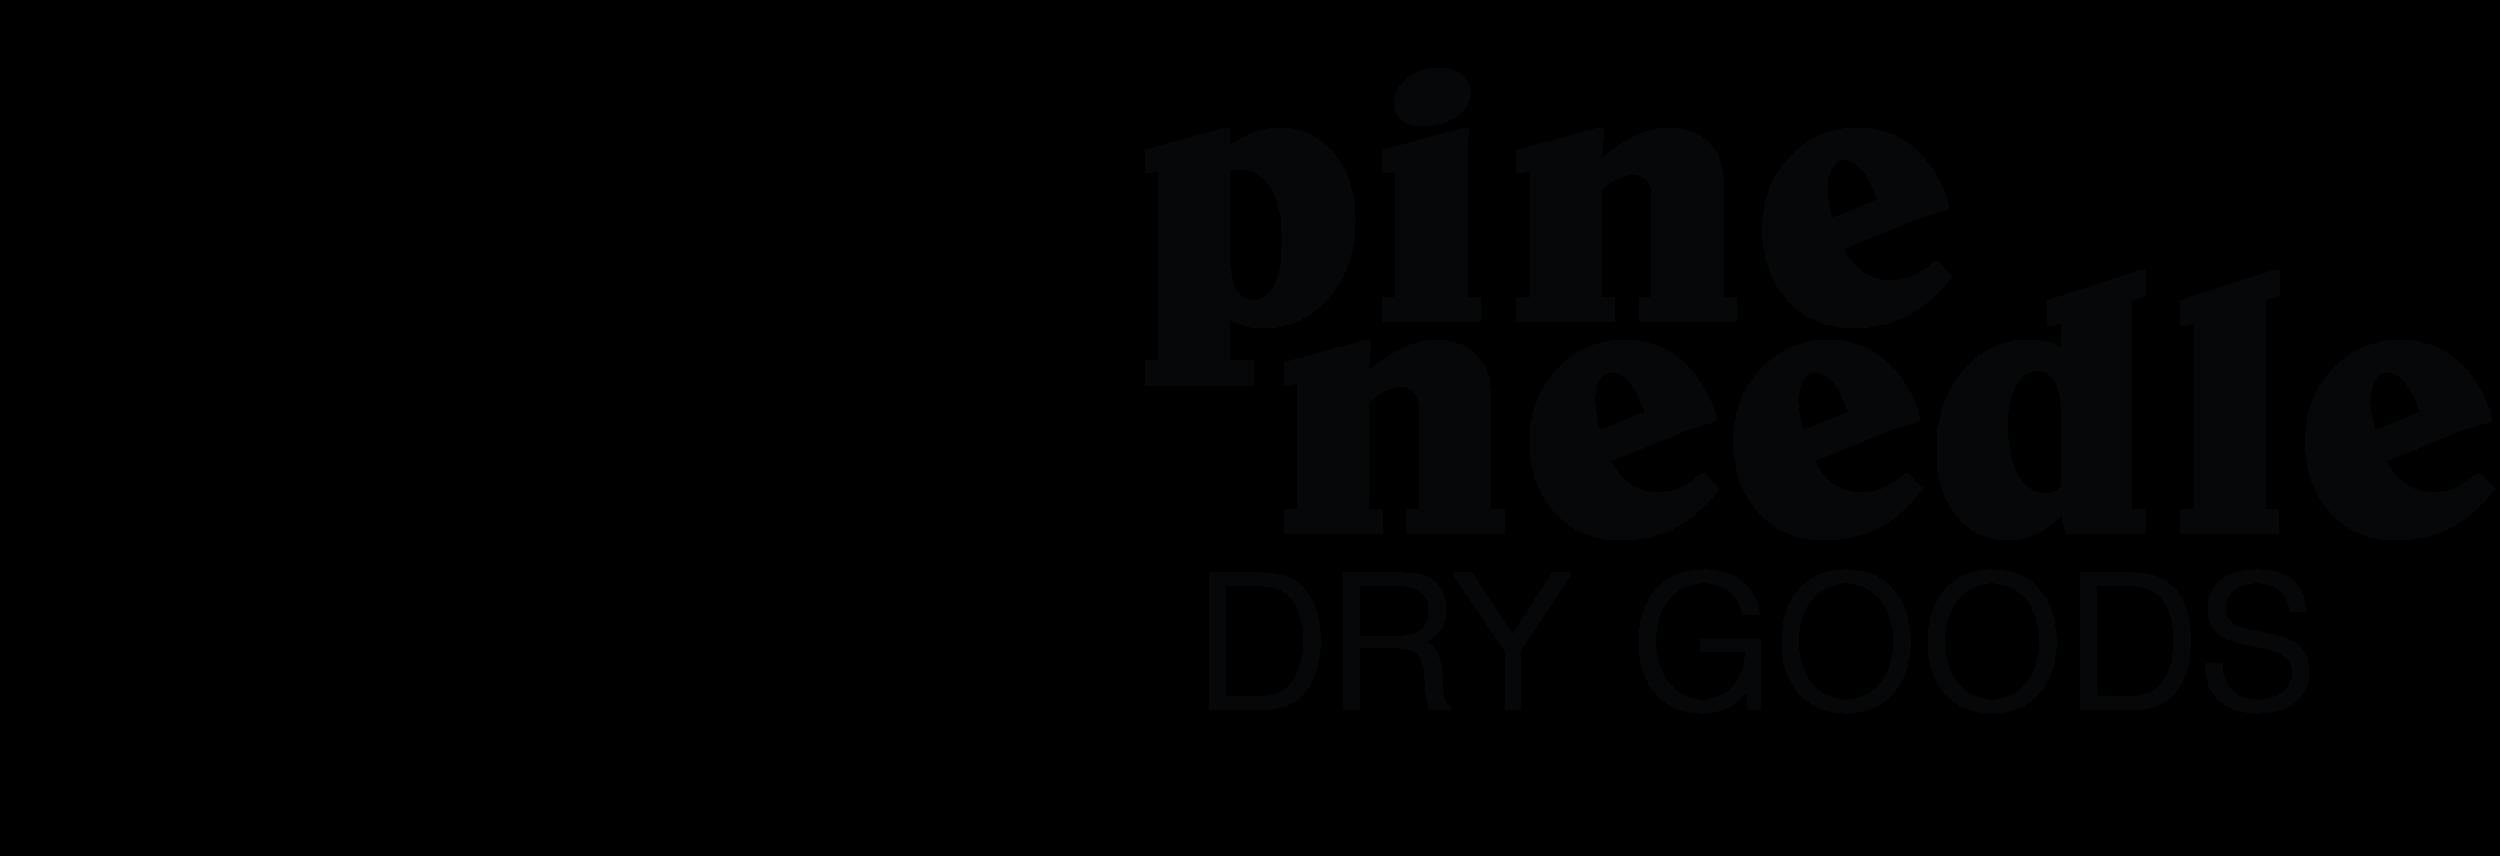 Pine Neede Dry Goods Logo_Black.png